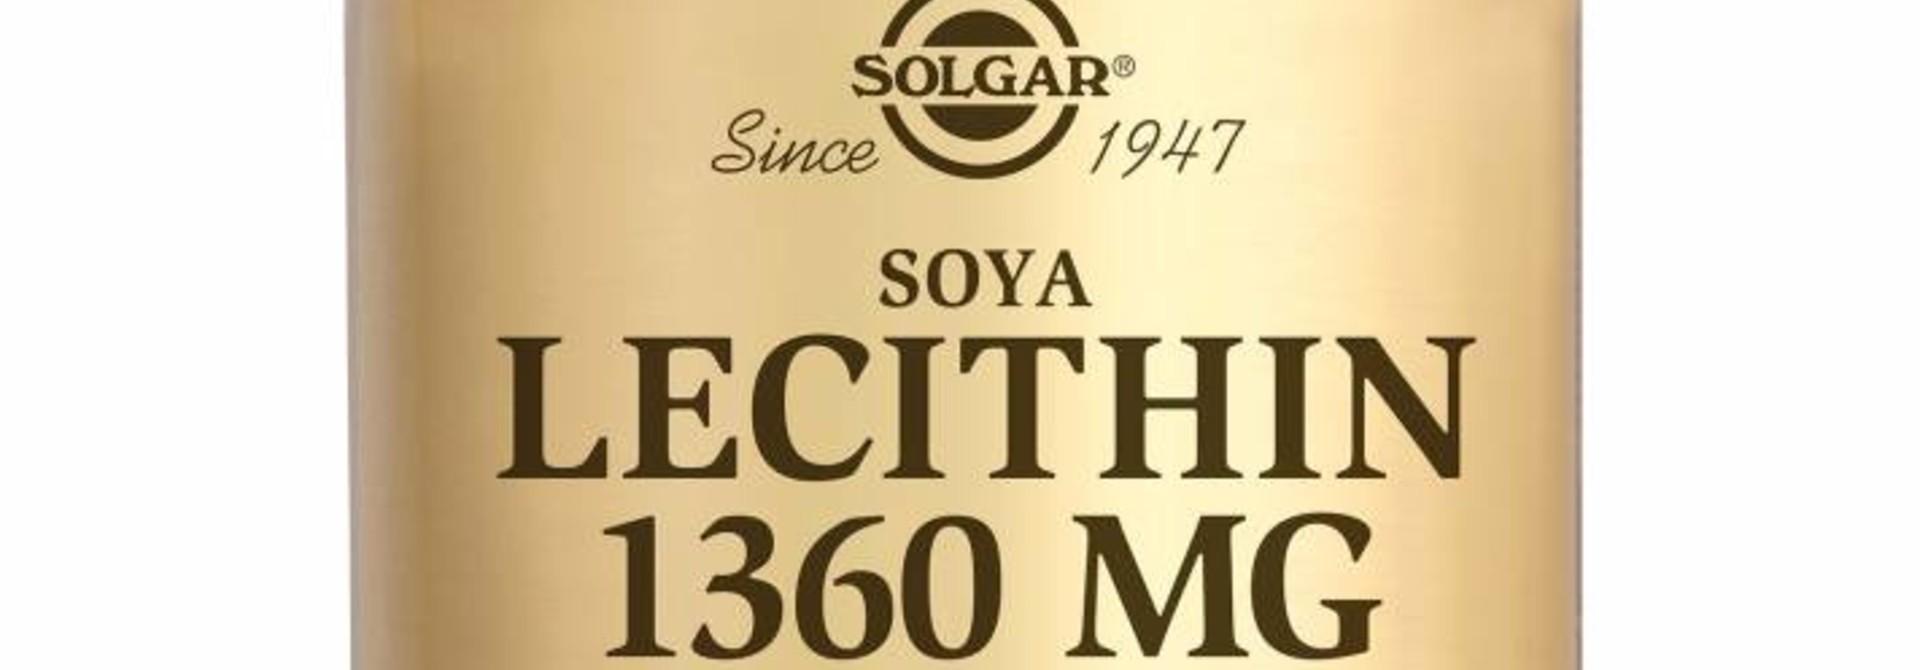 Lecithin 1360 mg 100 softgels